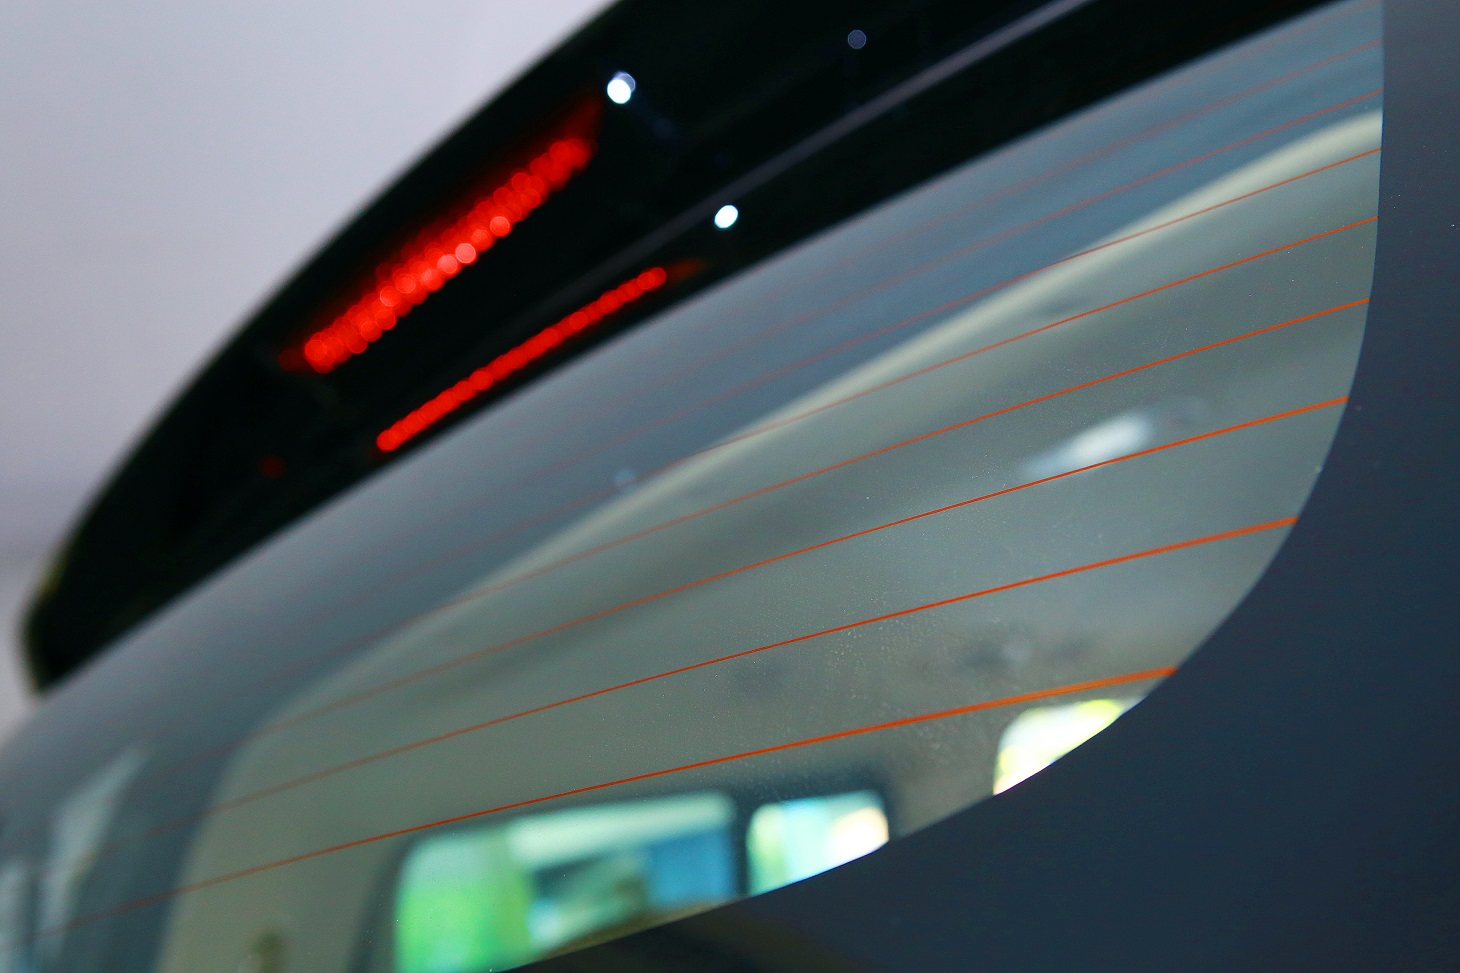 Mengenal Seberapa Penting Fungsi Defogger di Mobil